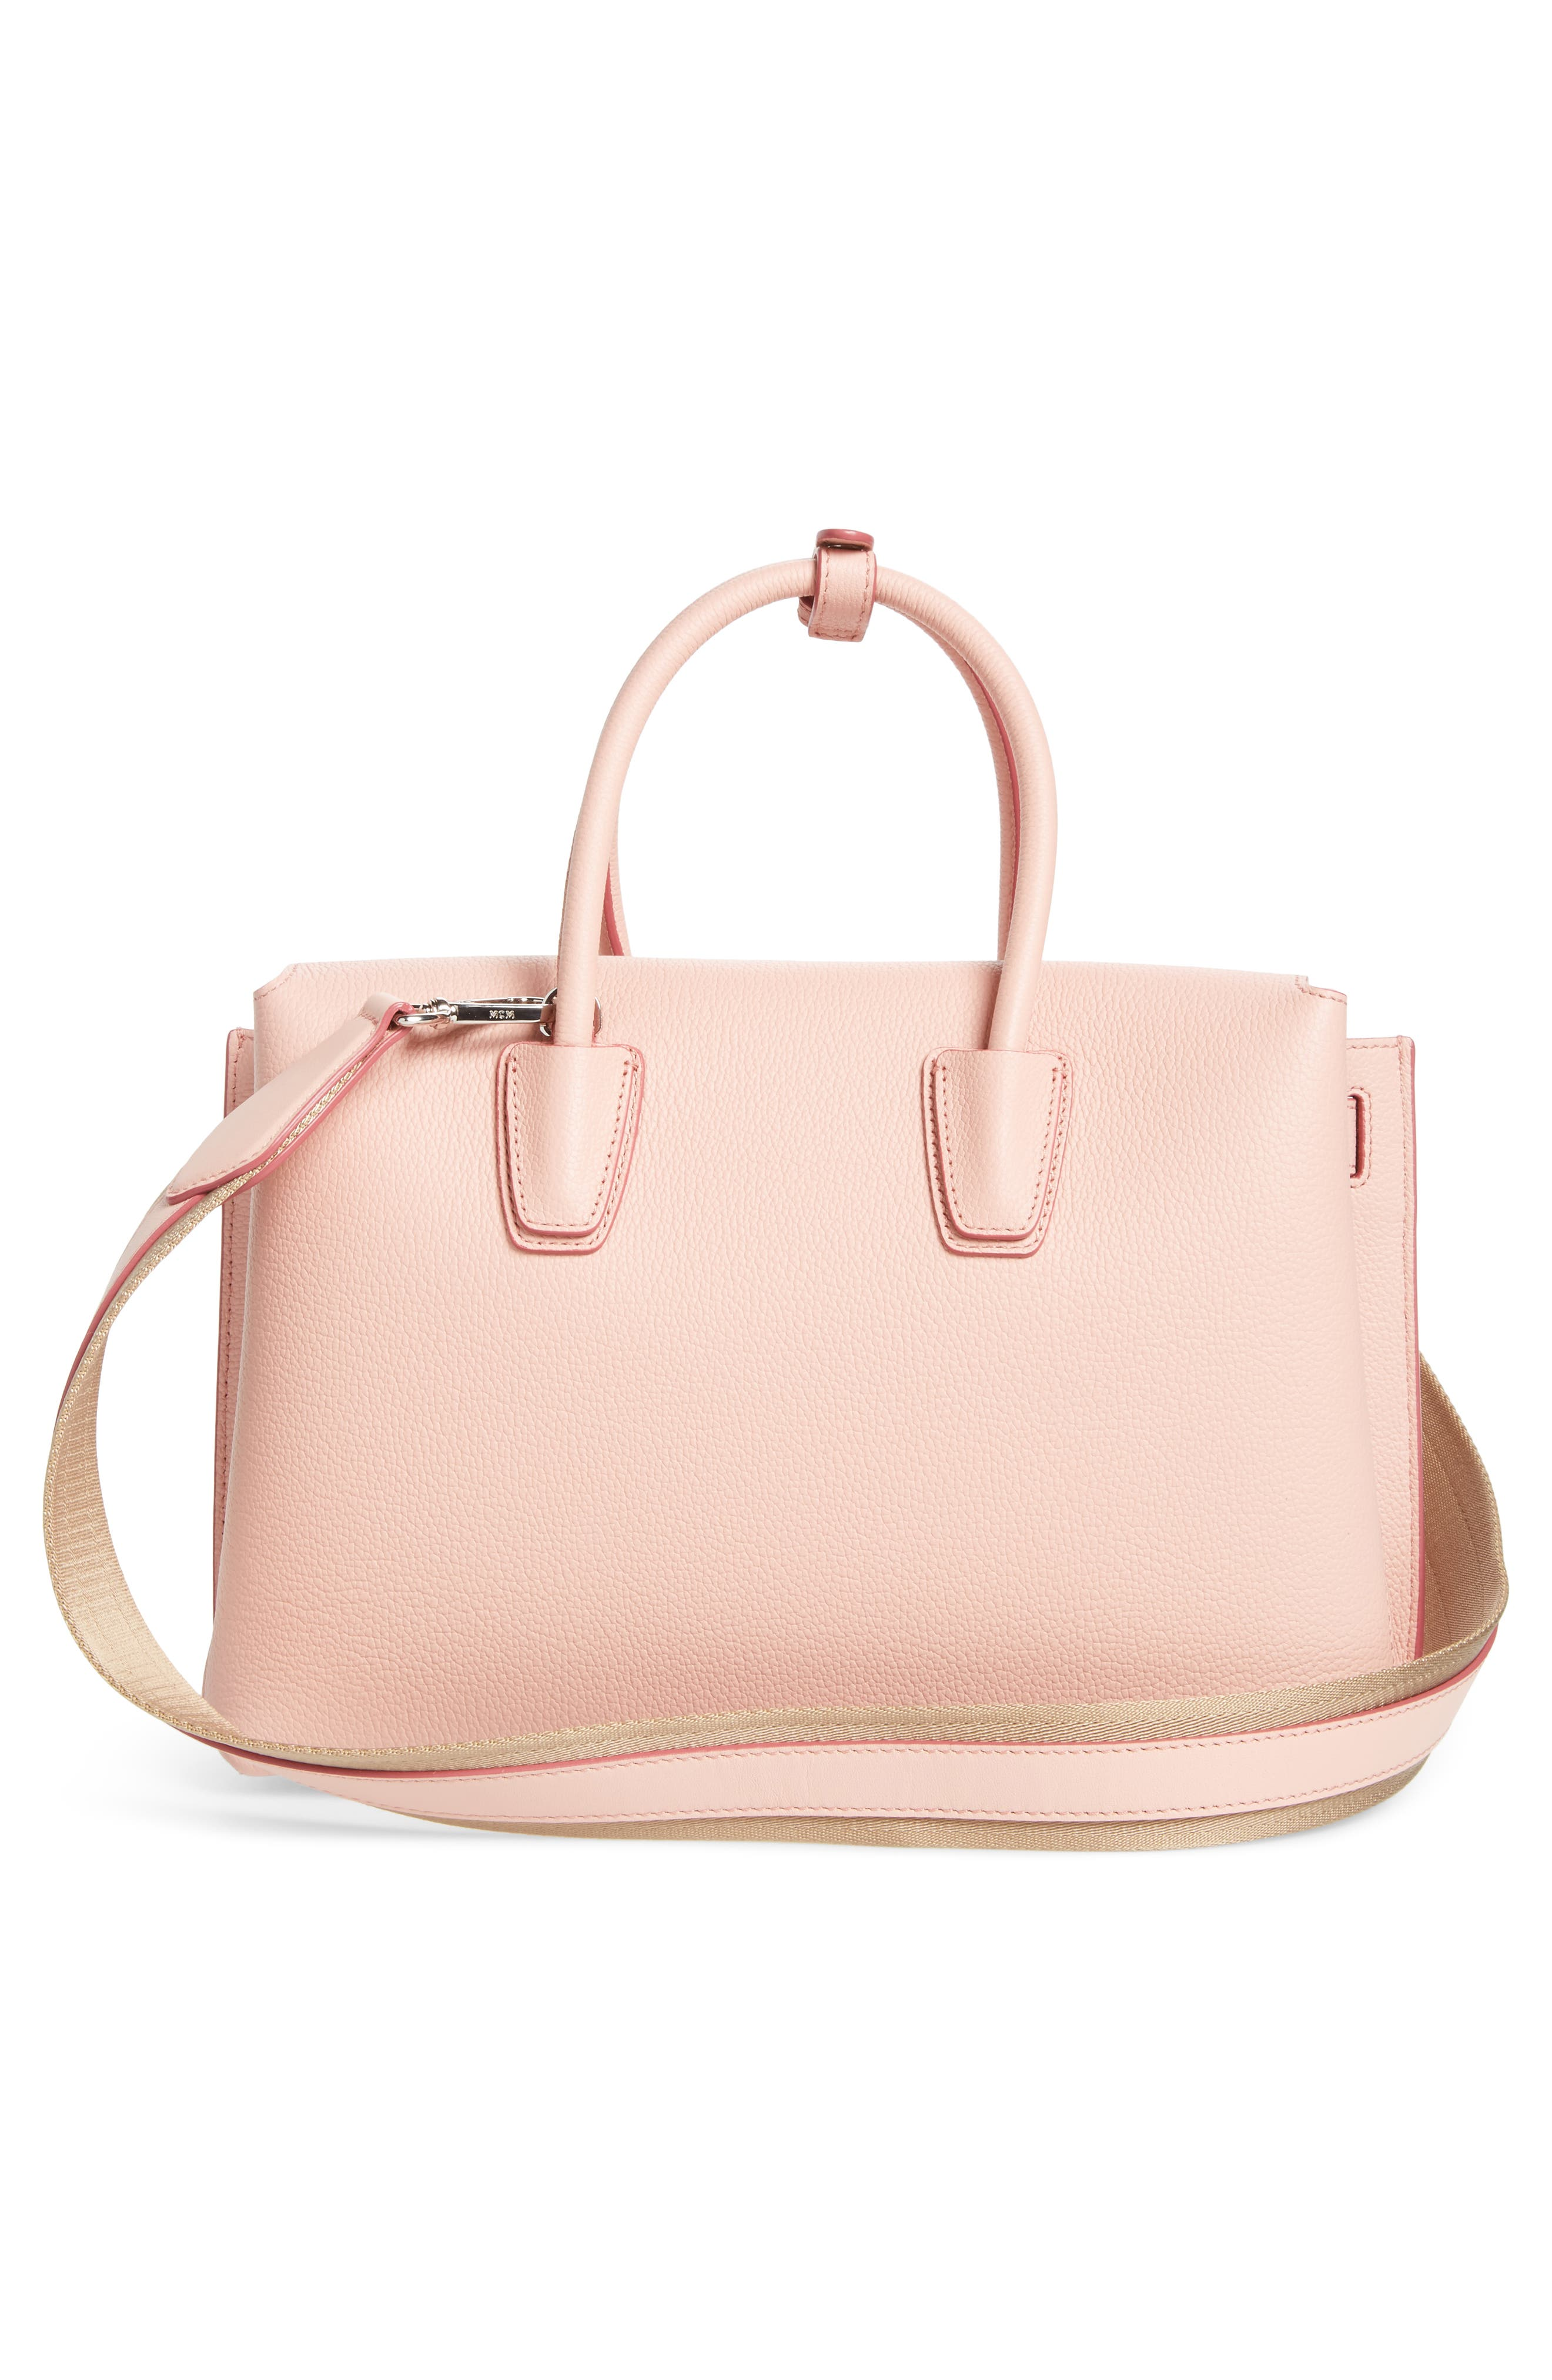 Medium Milla Leather Tote,                             Alternate thumbnail 3, color,                             Pink Blush